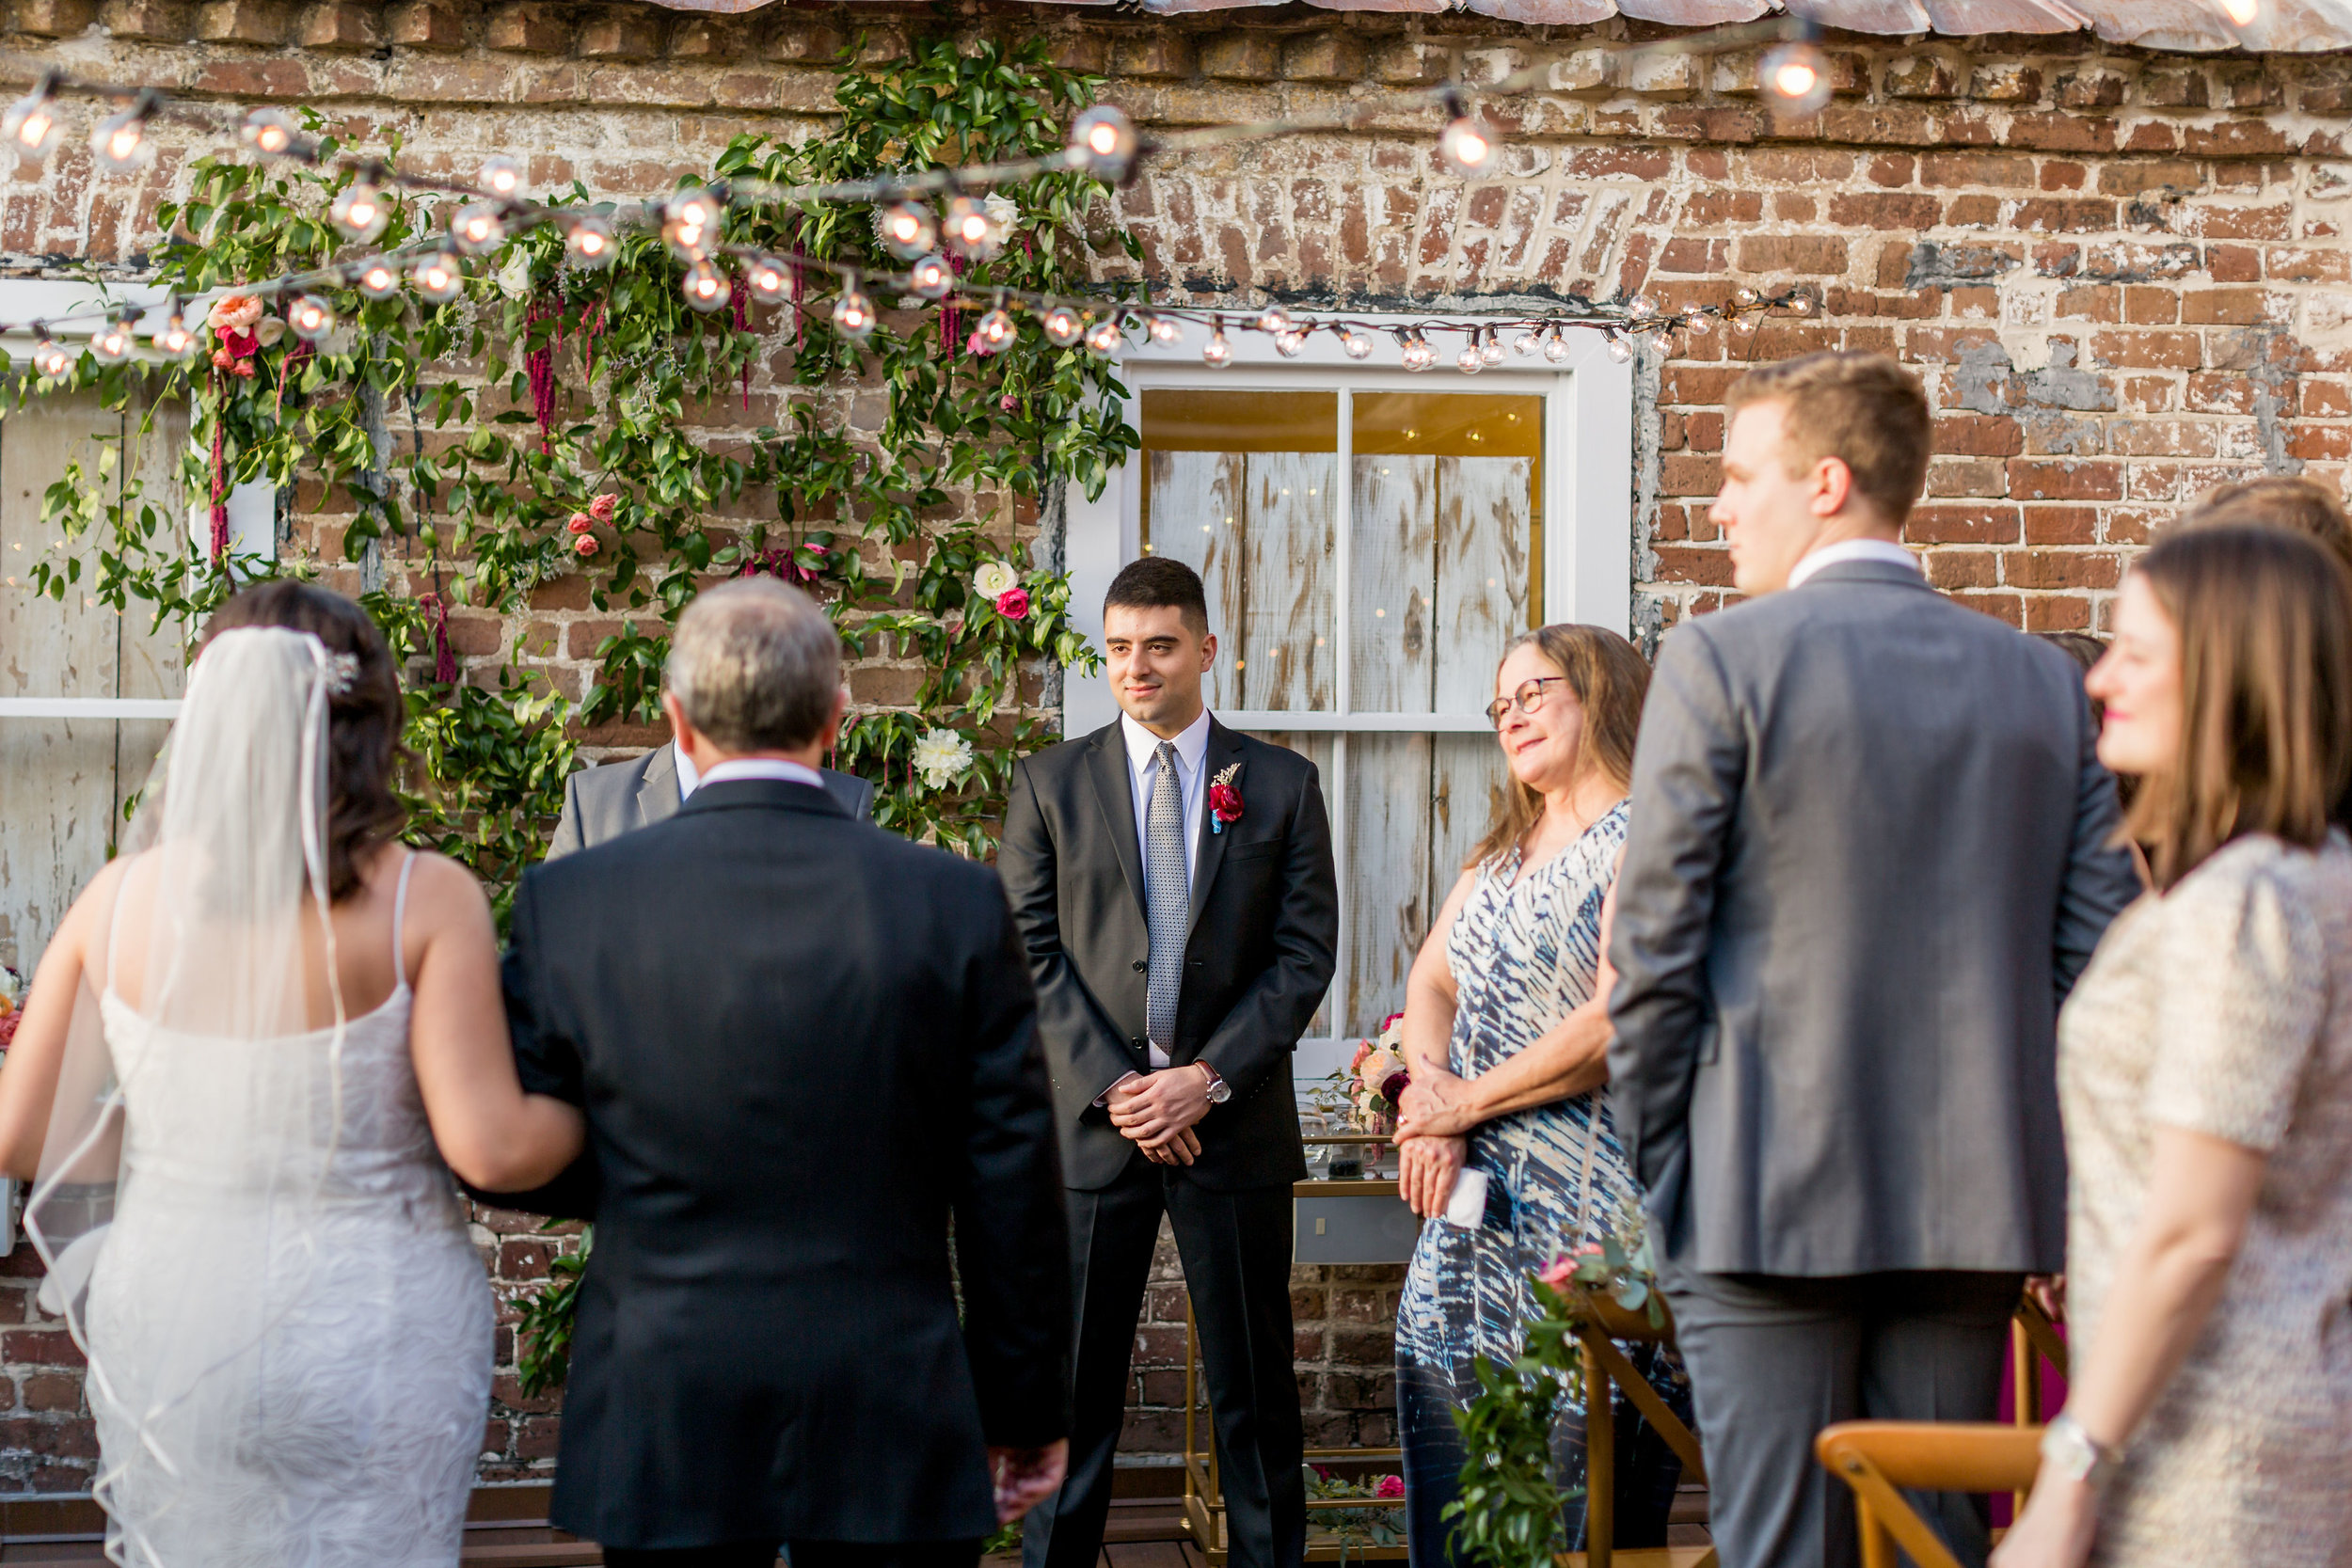 charleston new years elopement popup surprise wedding at upstairs at midtown - scarlet plan & design wedding planners (17).jpg